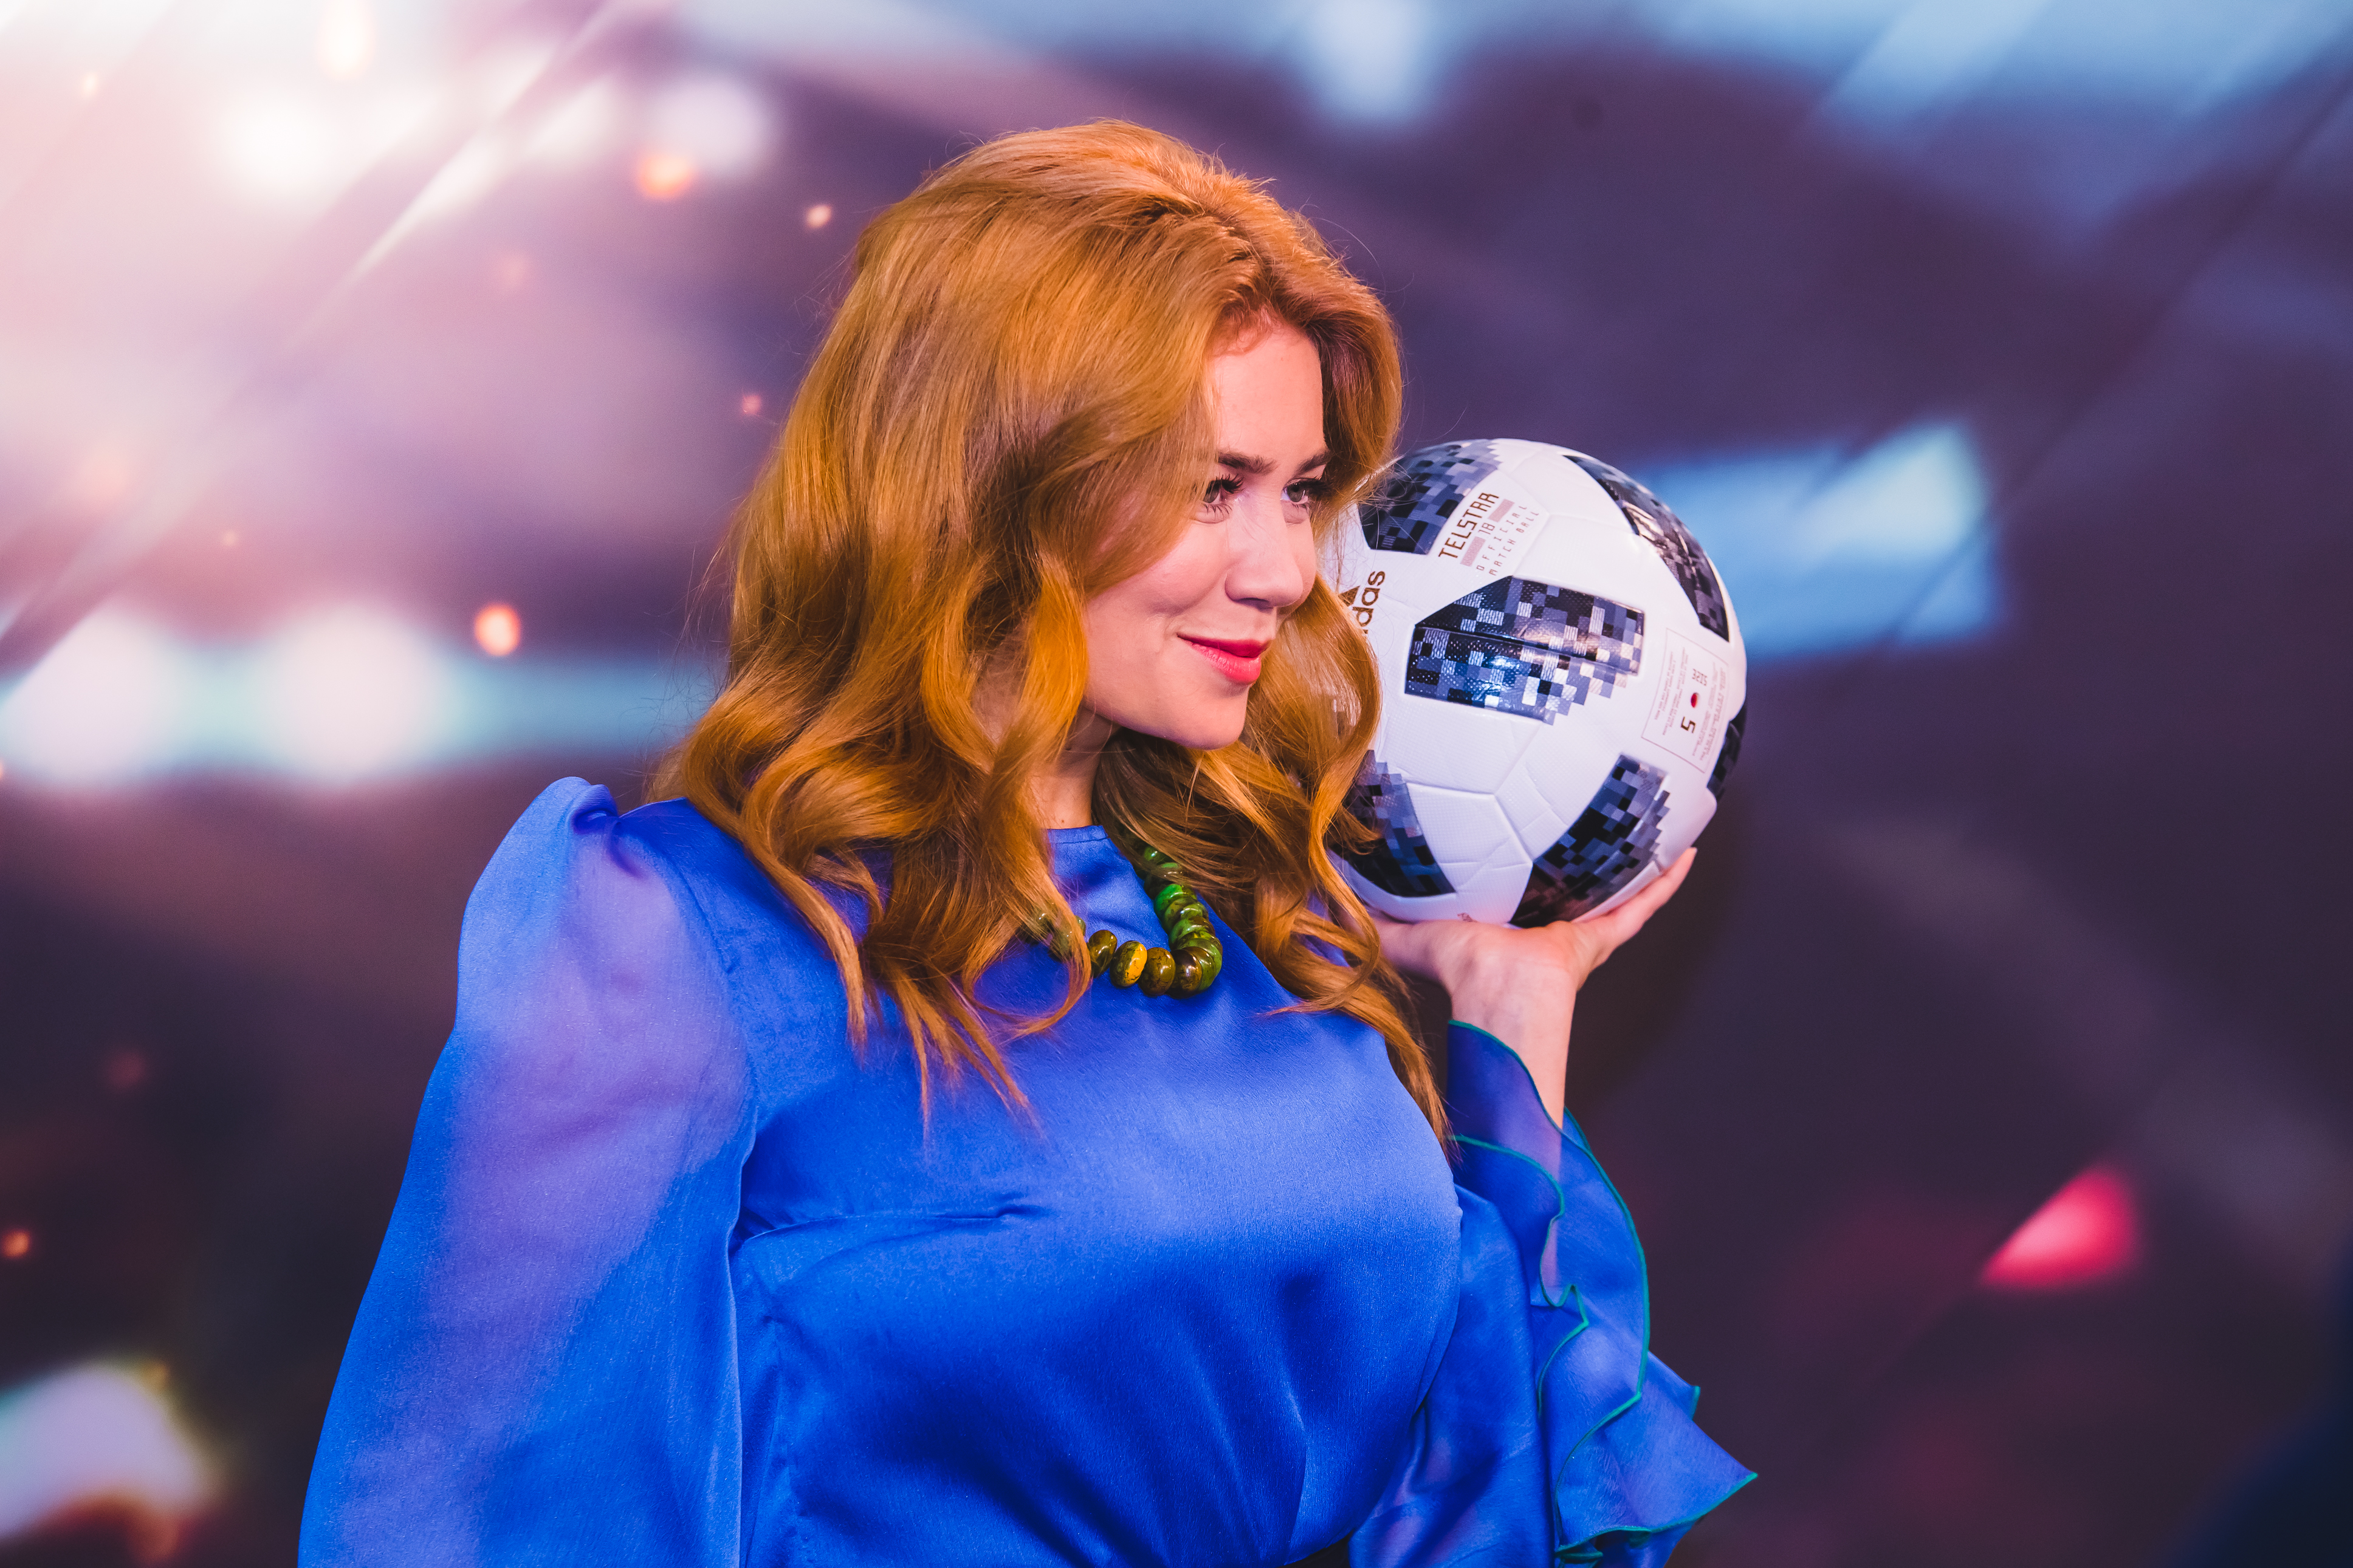 File 20180423 Fifa Fussball Wm 2018 Pressevorstellung Ard